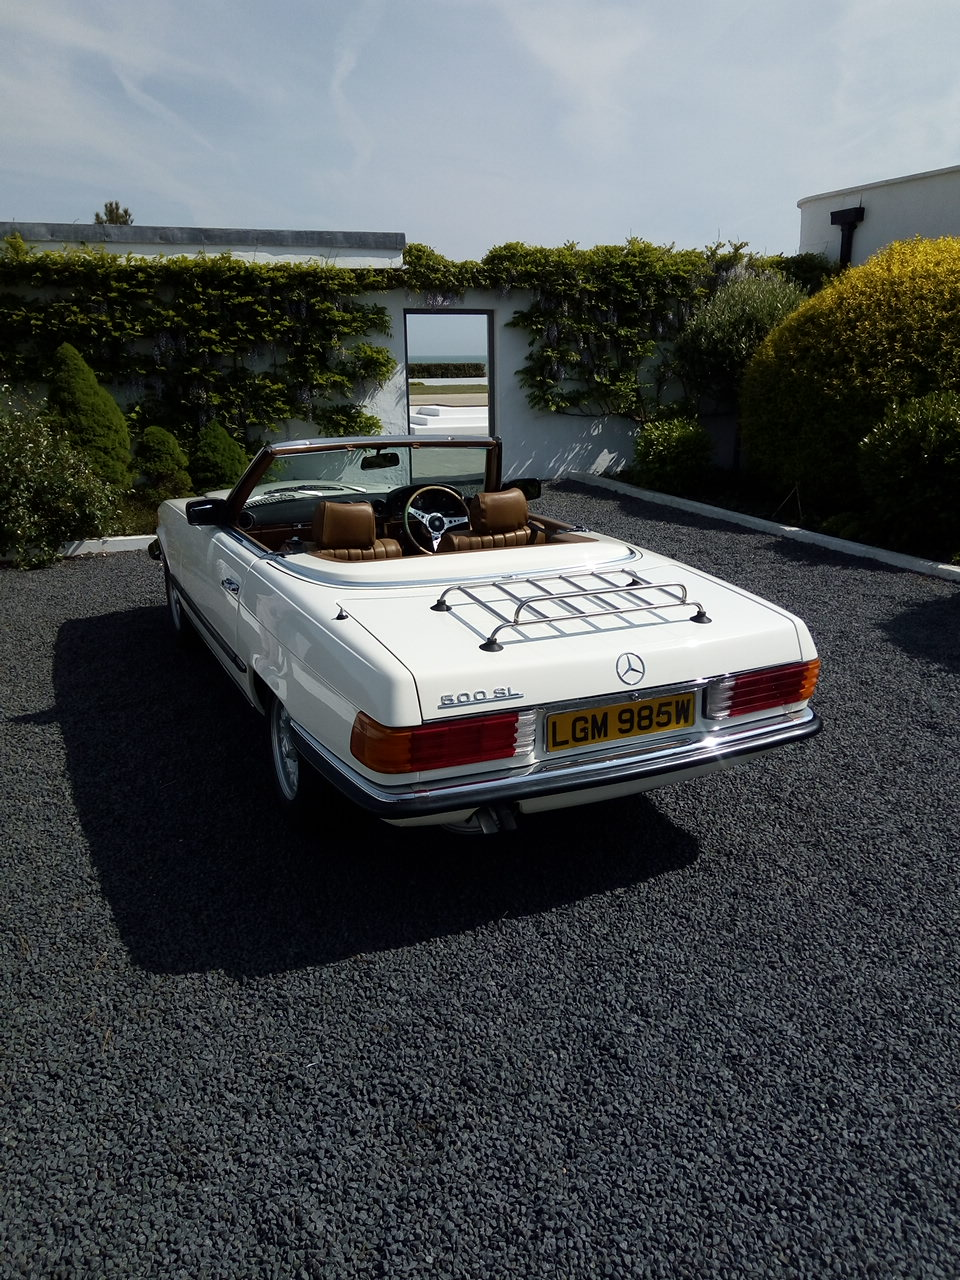 Fashion Shoot Featuring a 1981 Mercedes-Benz R107 500 SL, Restored